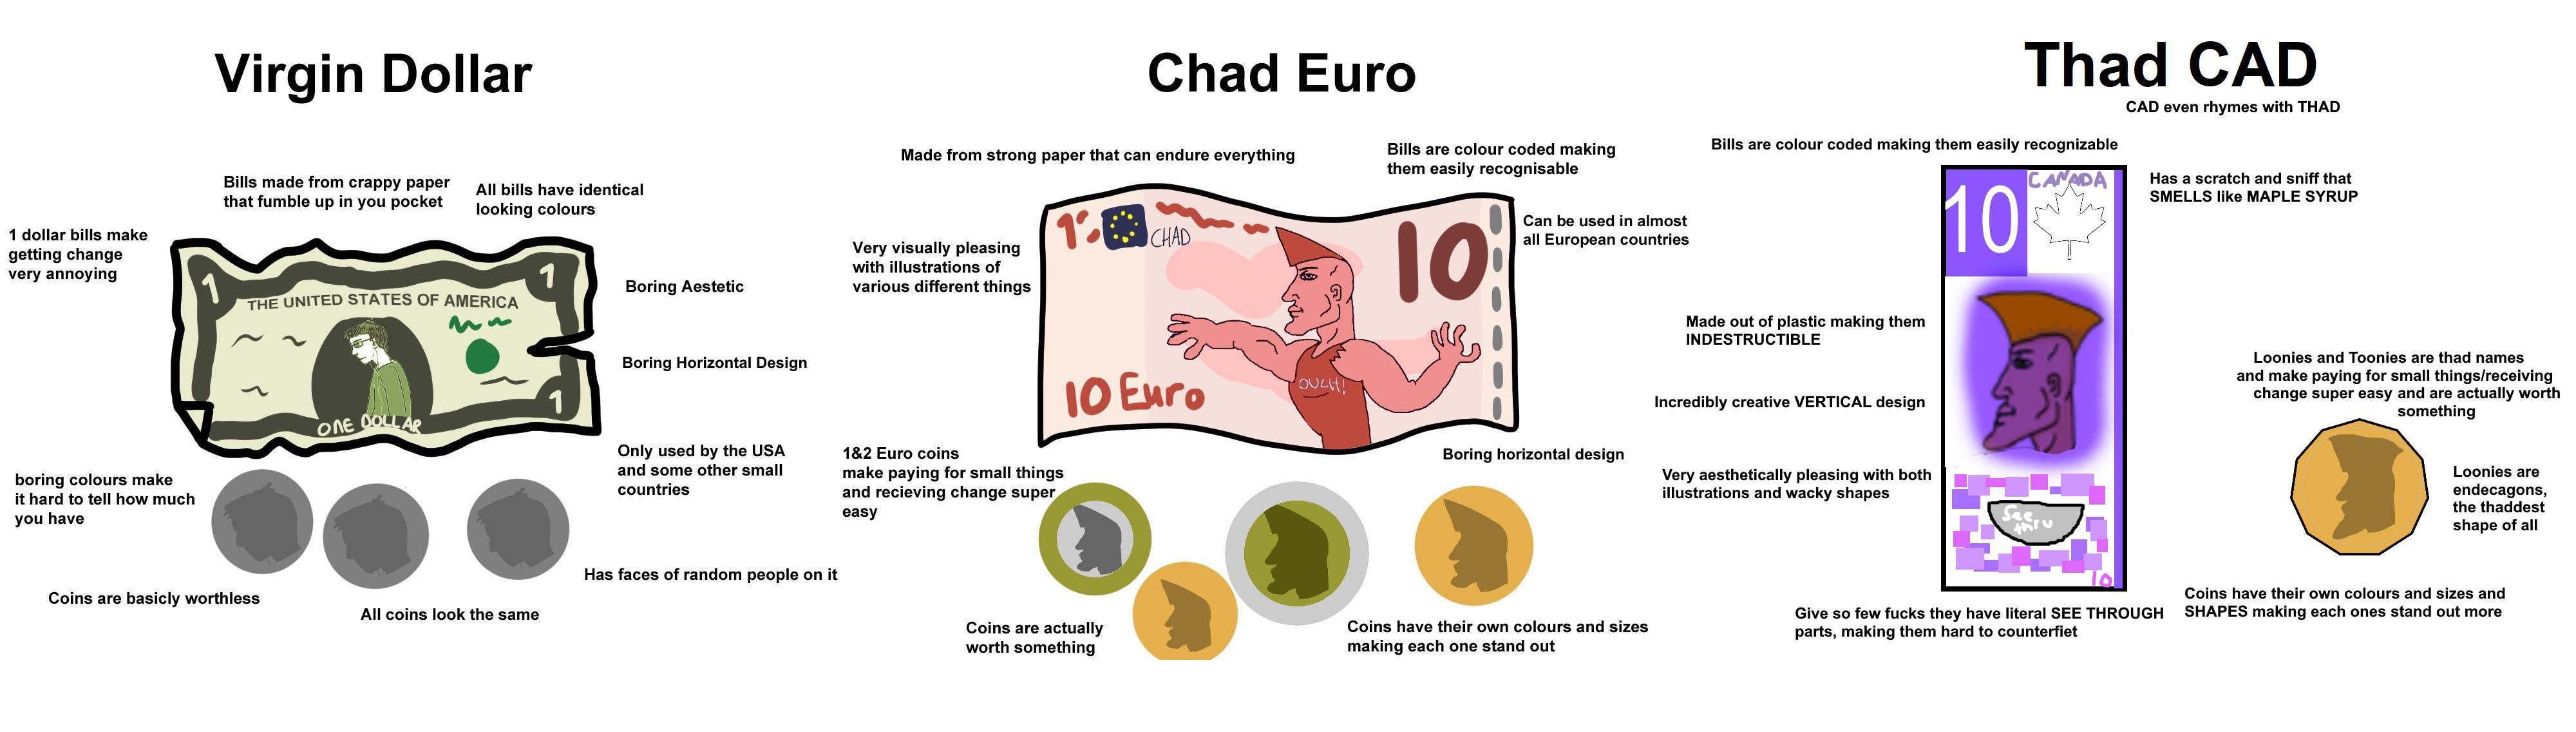 Virgin USD vs Chad Euro vs Thad CAD